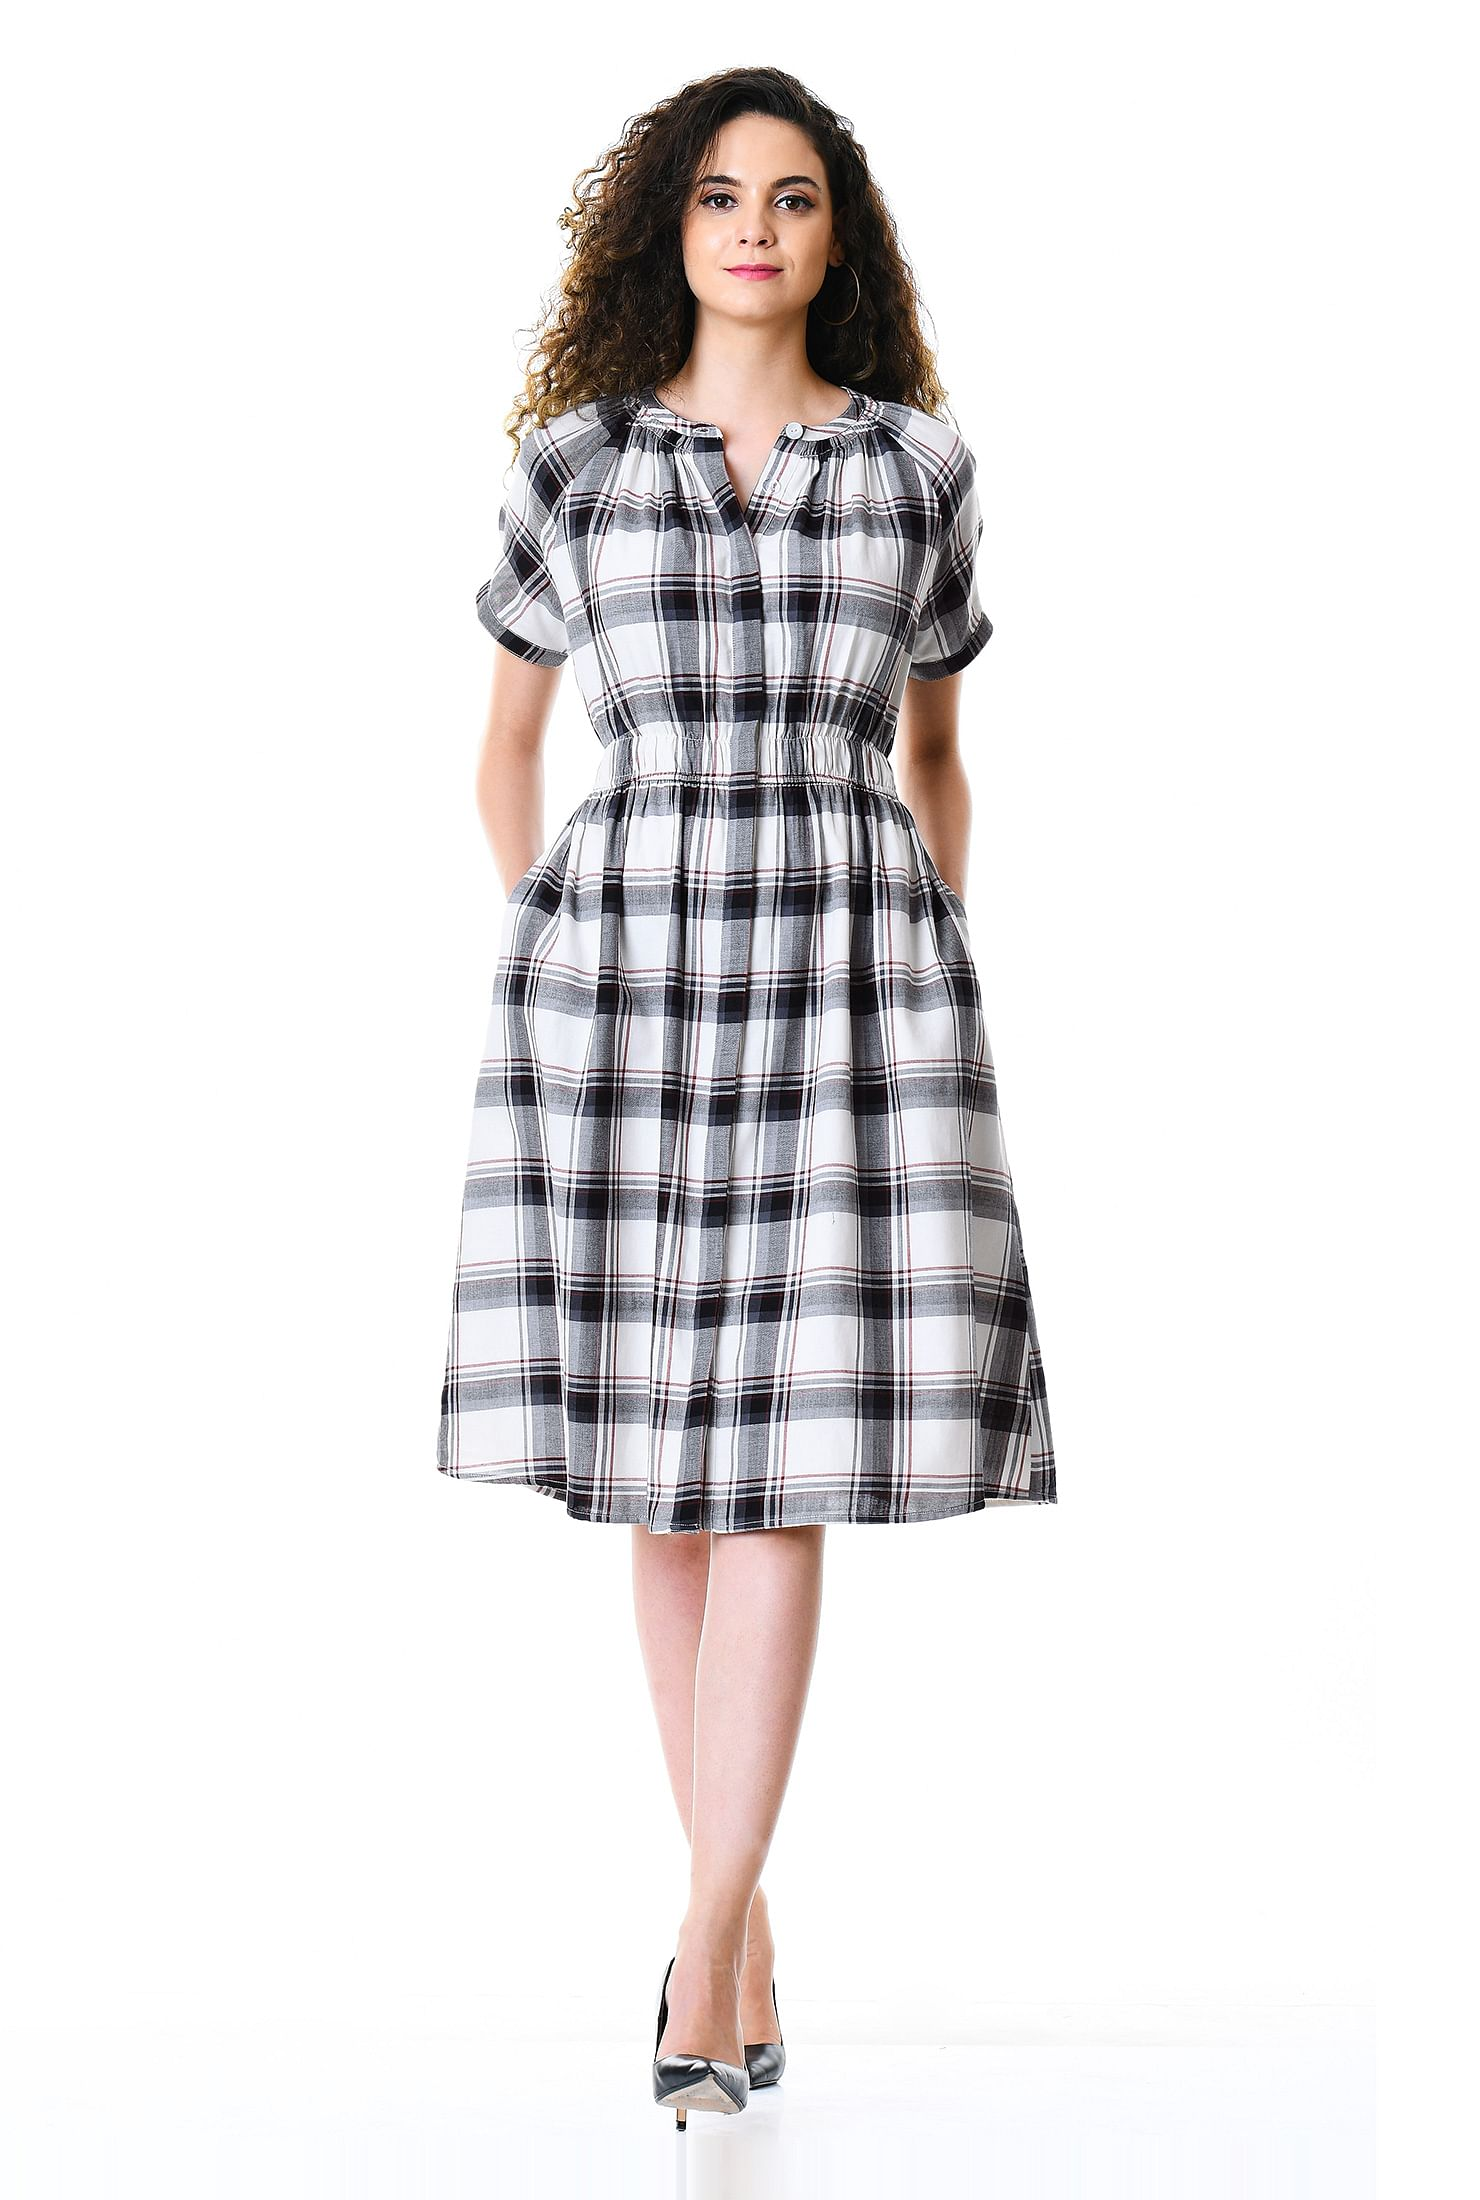 290b254d2f Women's Fashion Clothing 0-36W and Custom